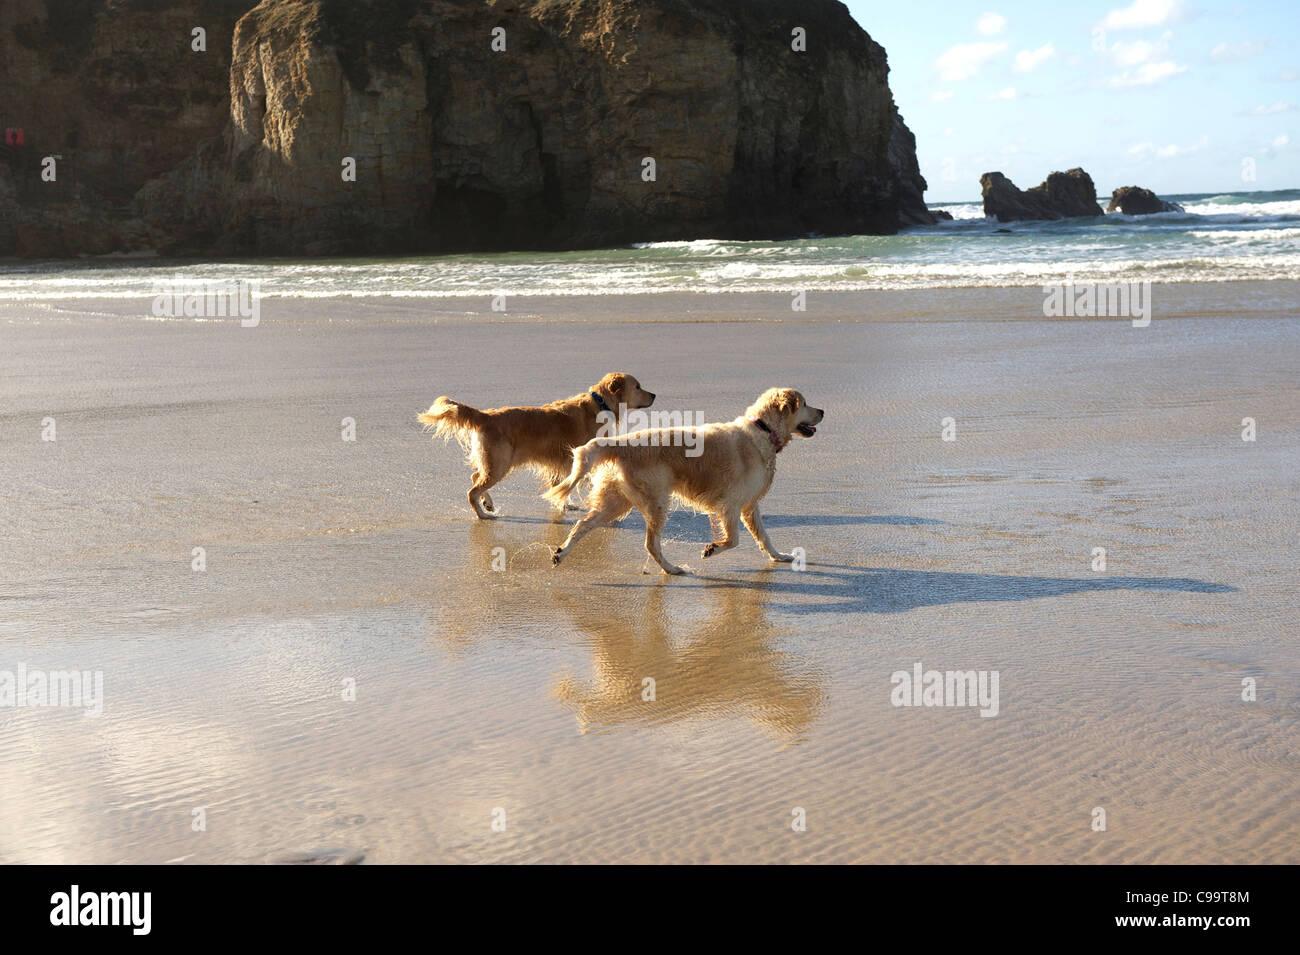 Two Golden Retrievers walking on a beautiful beach - Stock Image